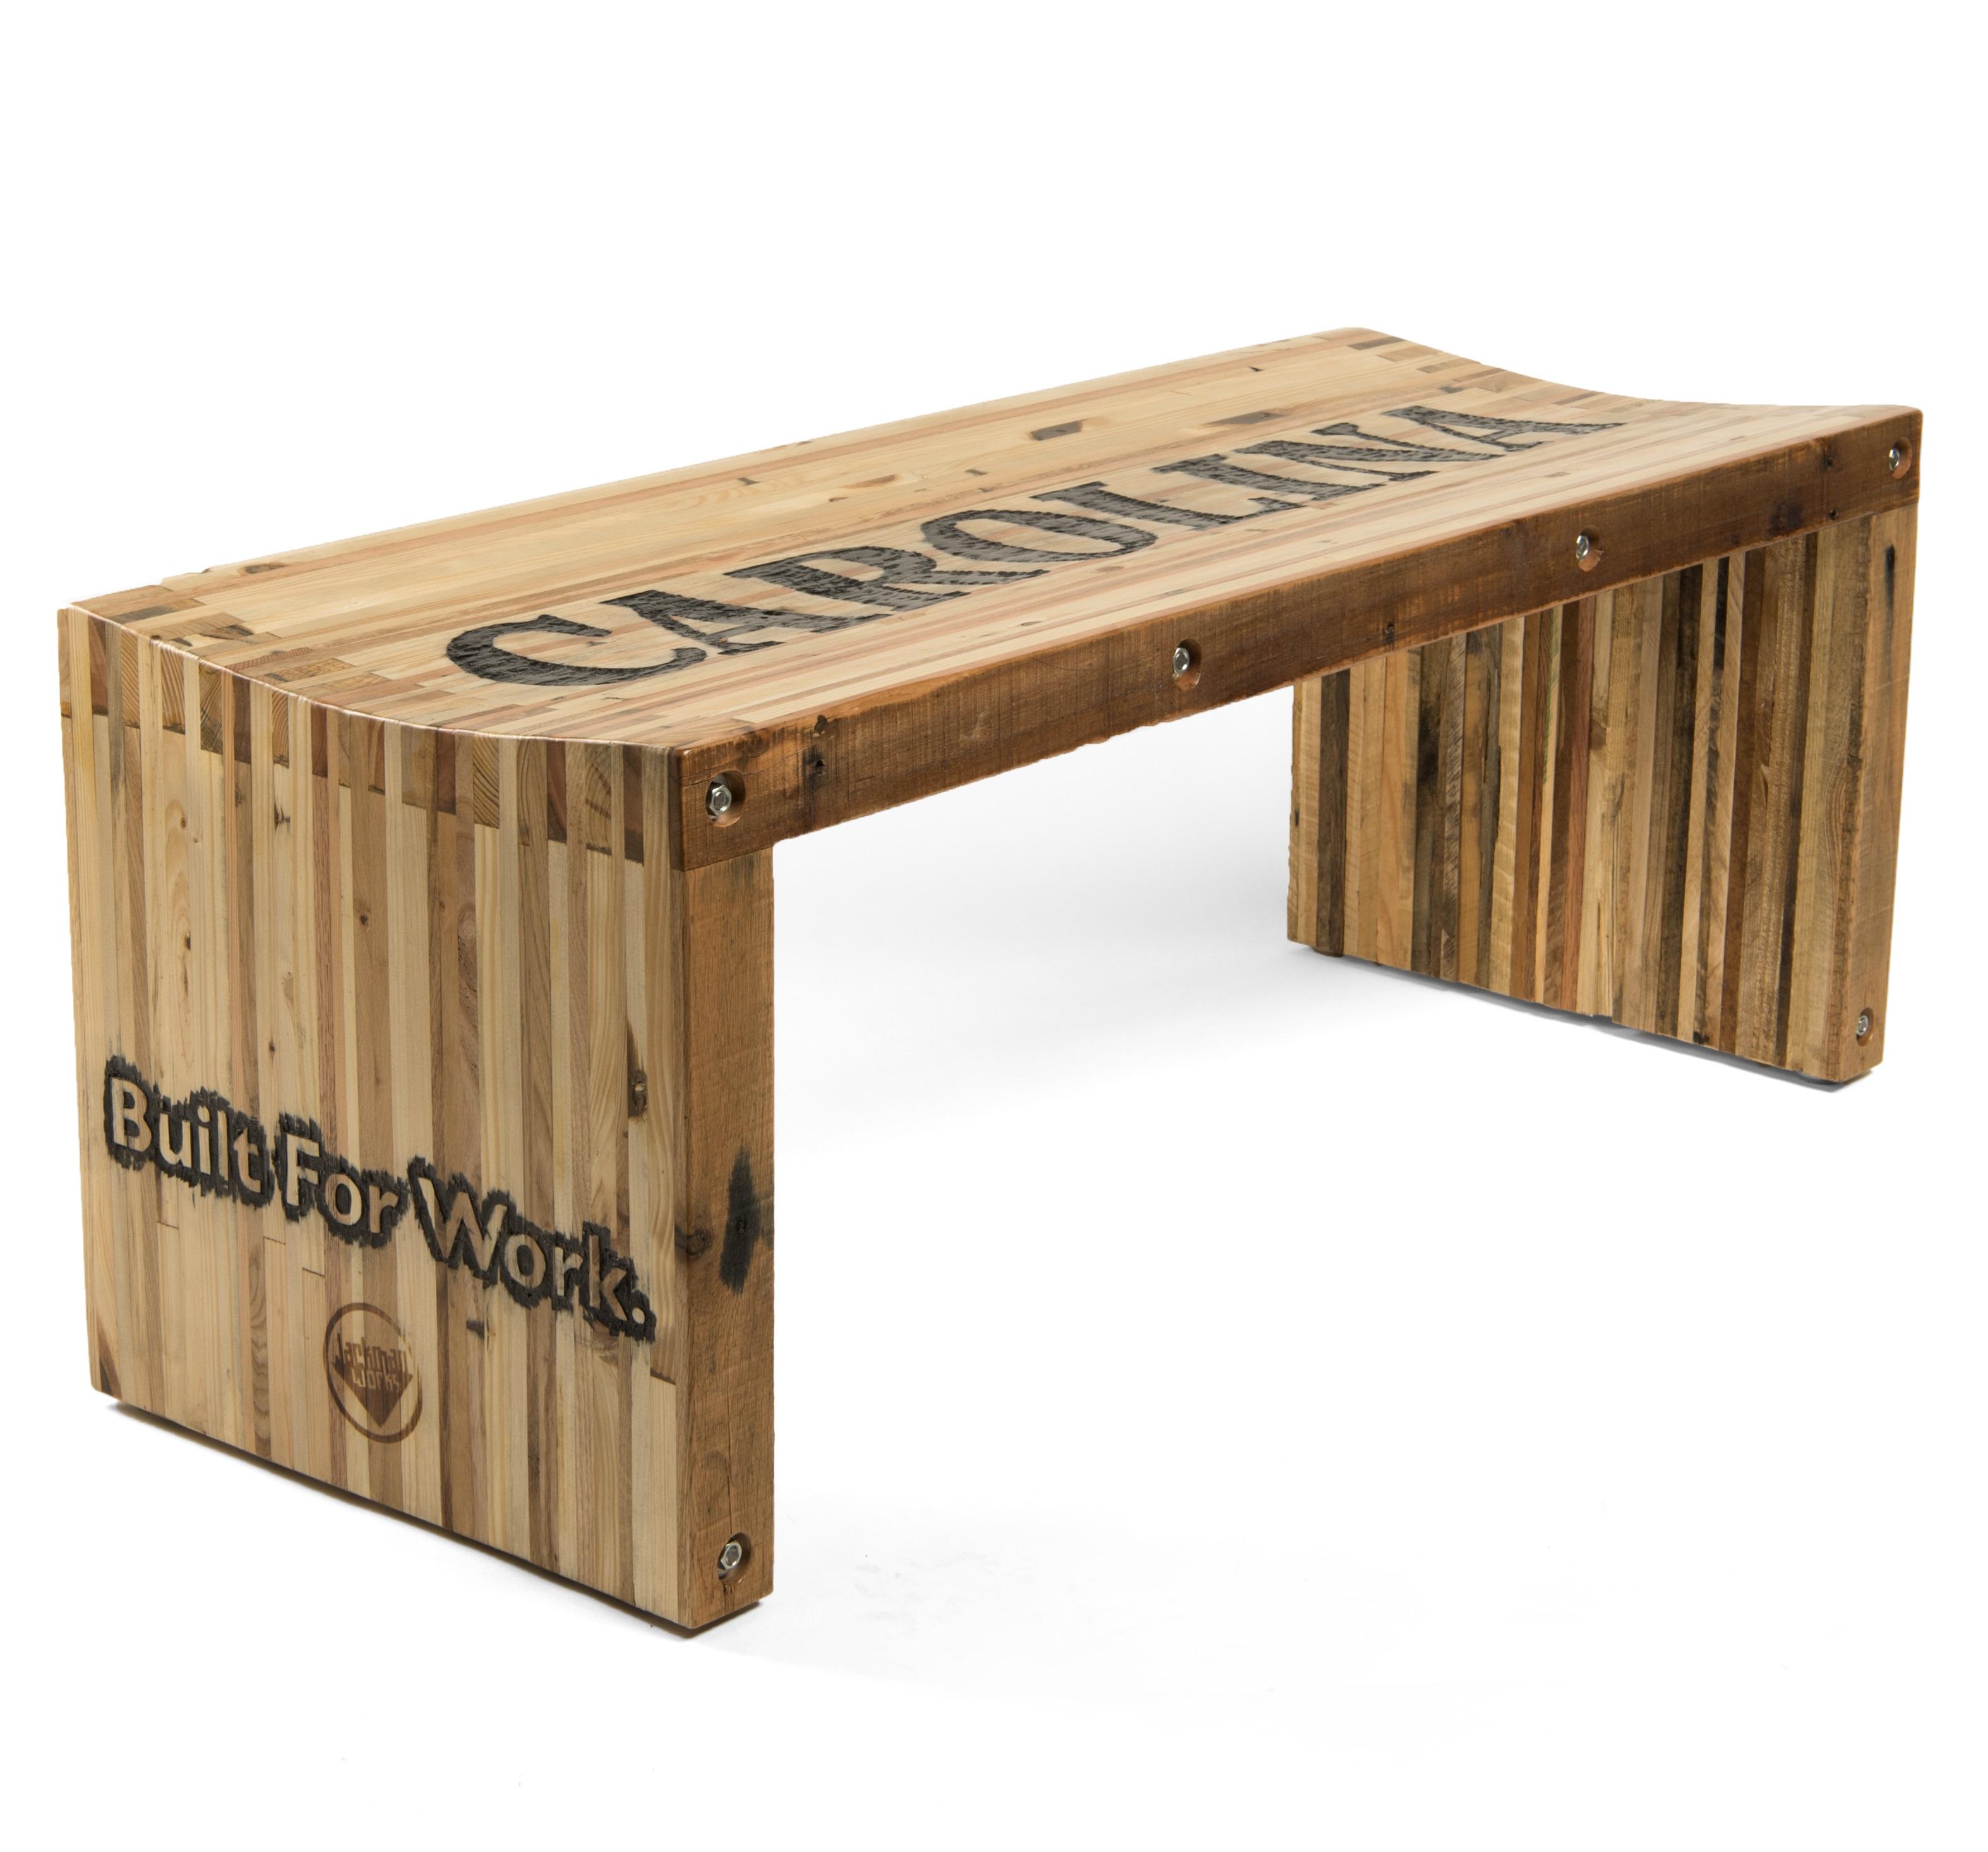 Pallet Wood Slat Bench Jackman Works